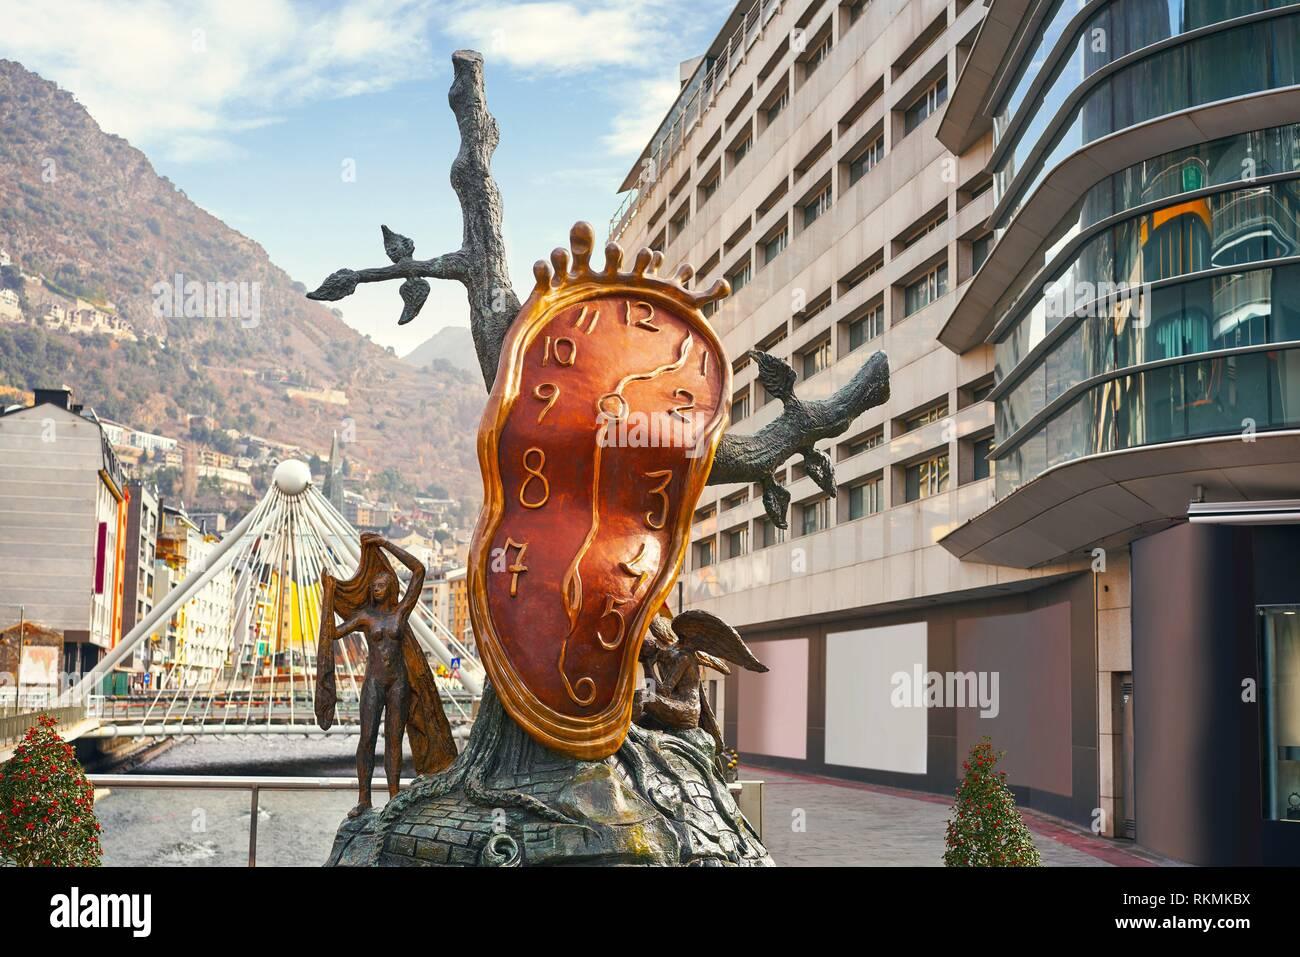 Andorra la Vella Salvador Dali Noblesse du Temps sculpture in Pyrenees. Stock Photo